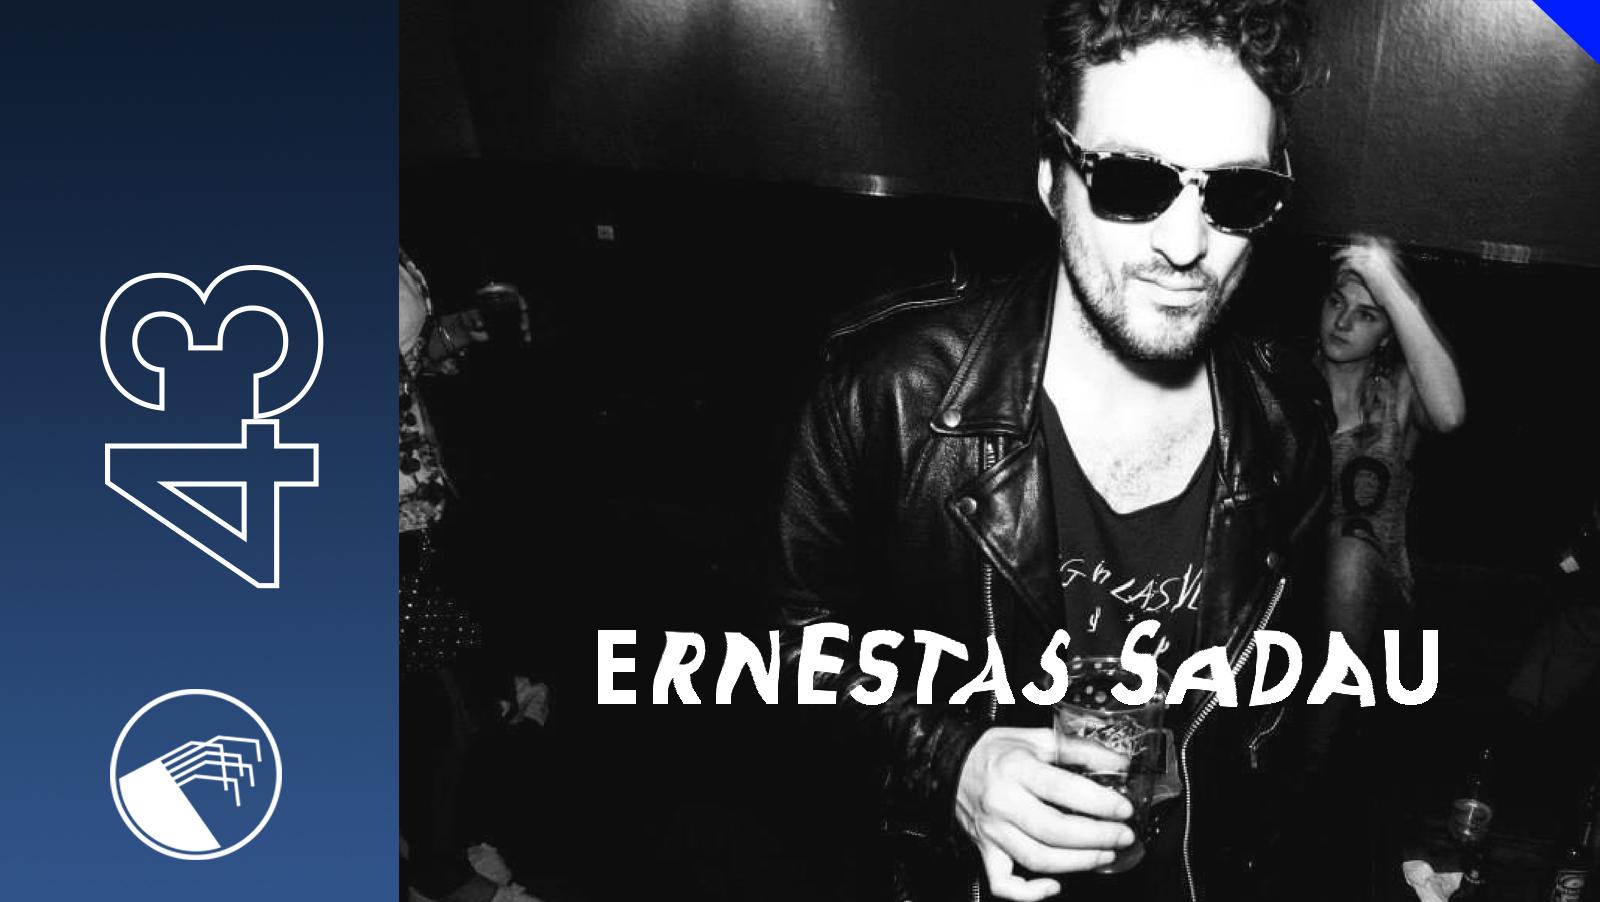 043 Ernestas Sadau